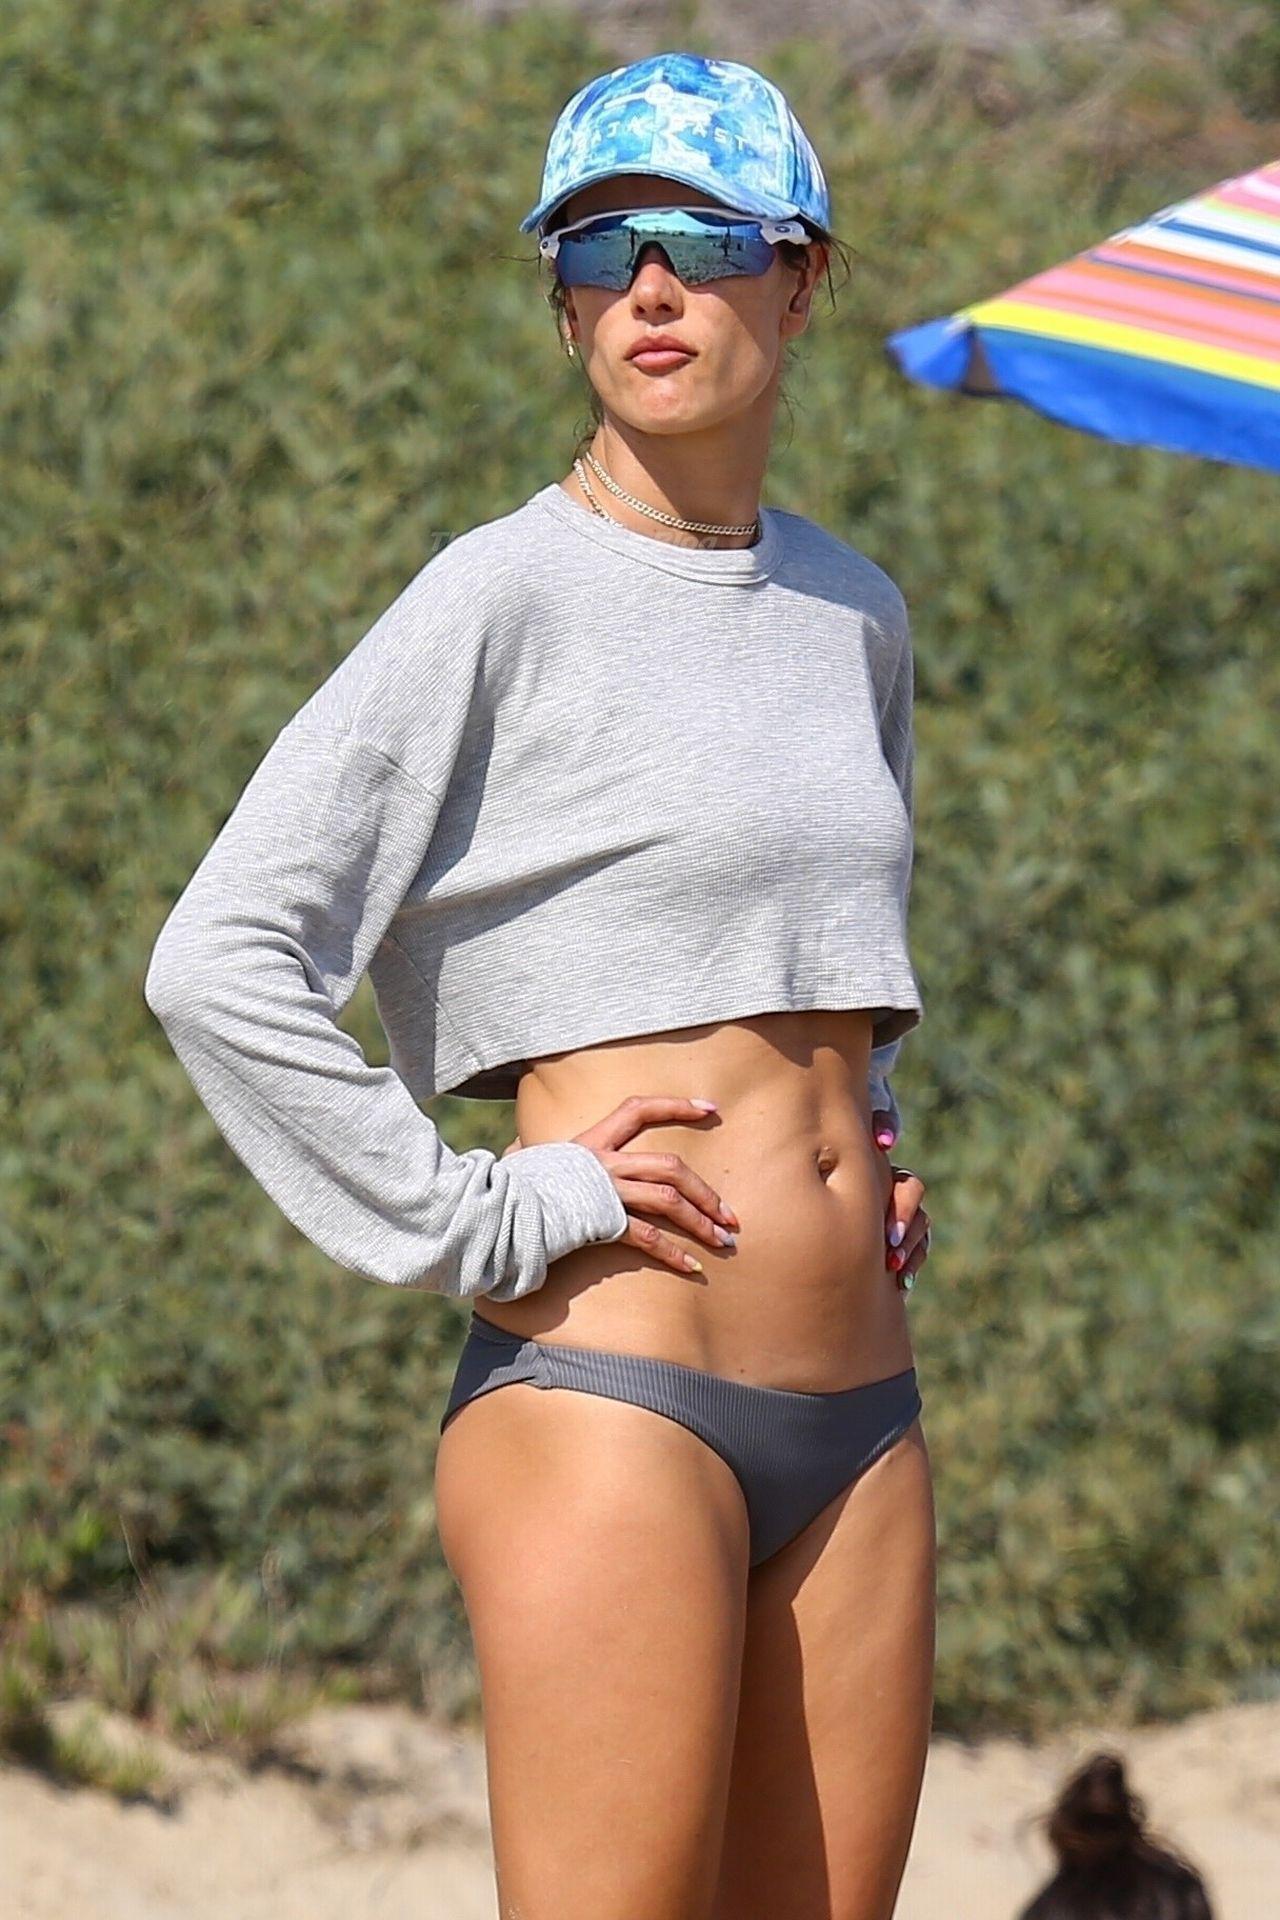 Alessandra-Ambrosio-Sexy-The-Fappening-Blog-15-3.jpg